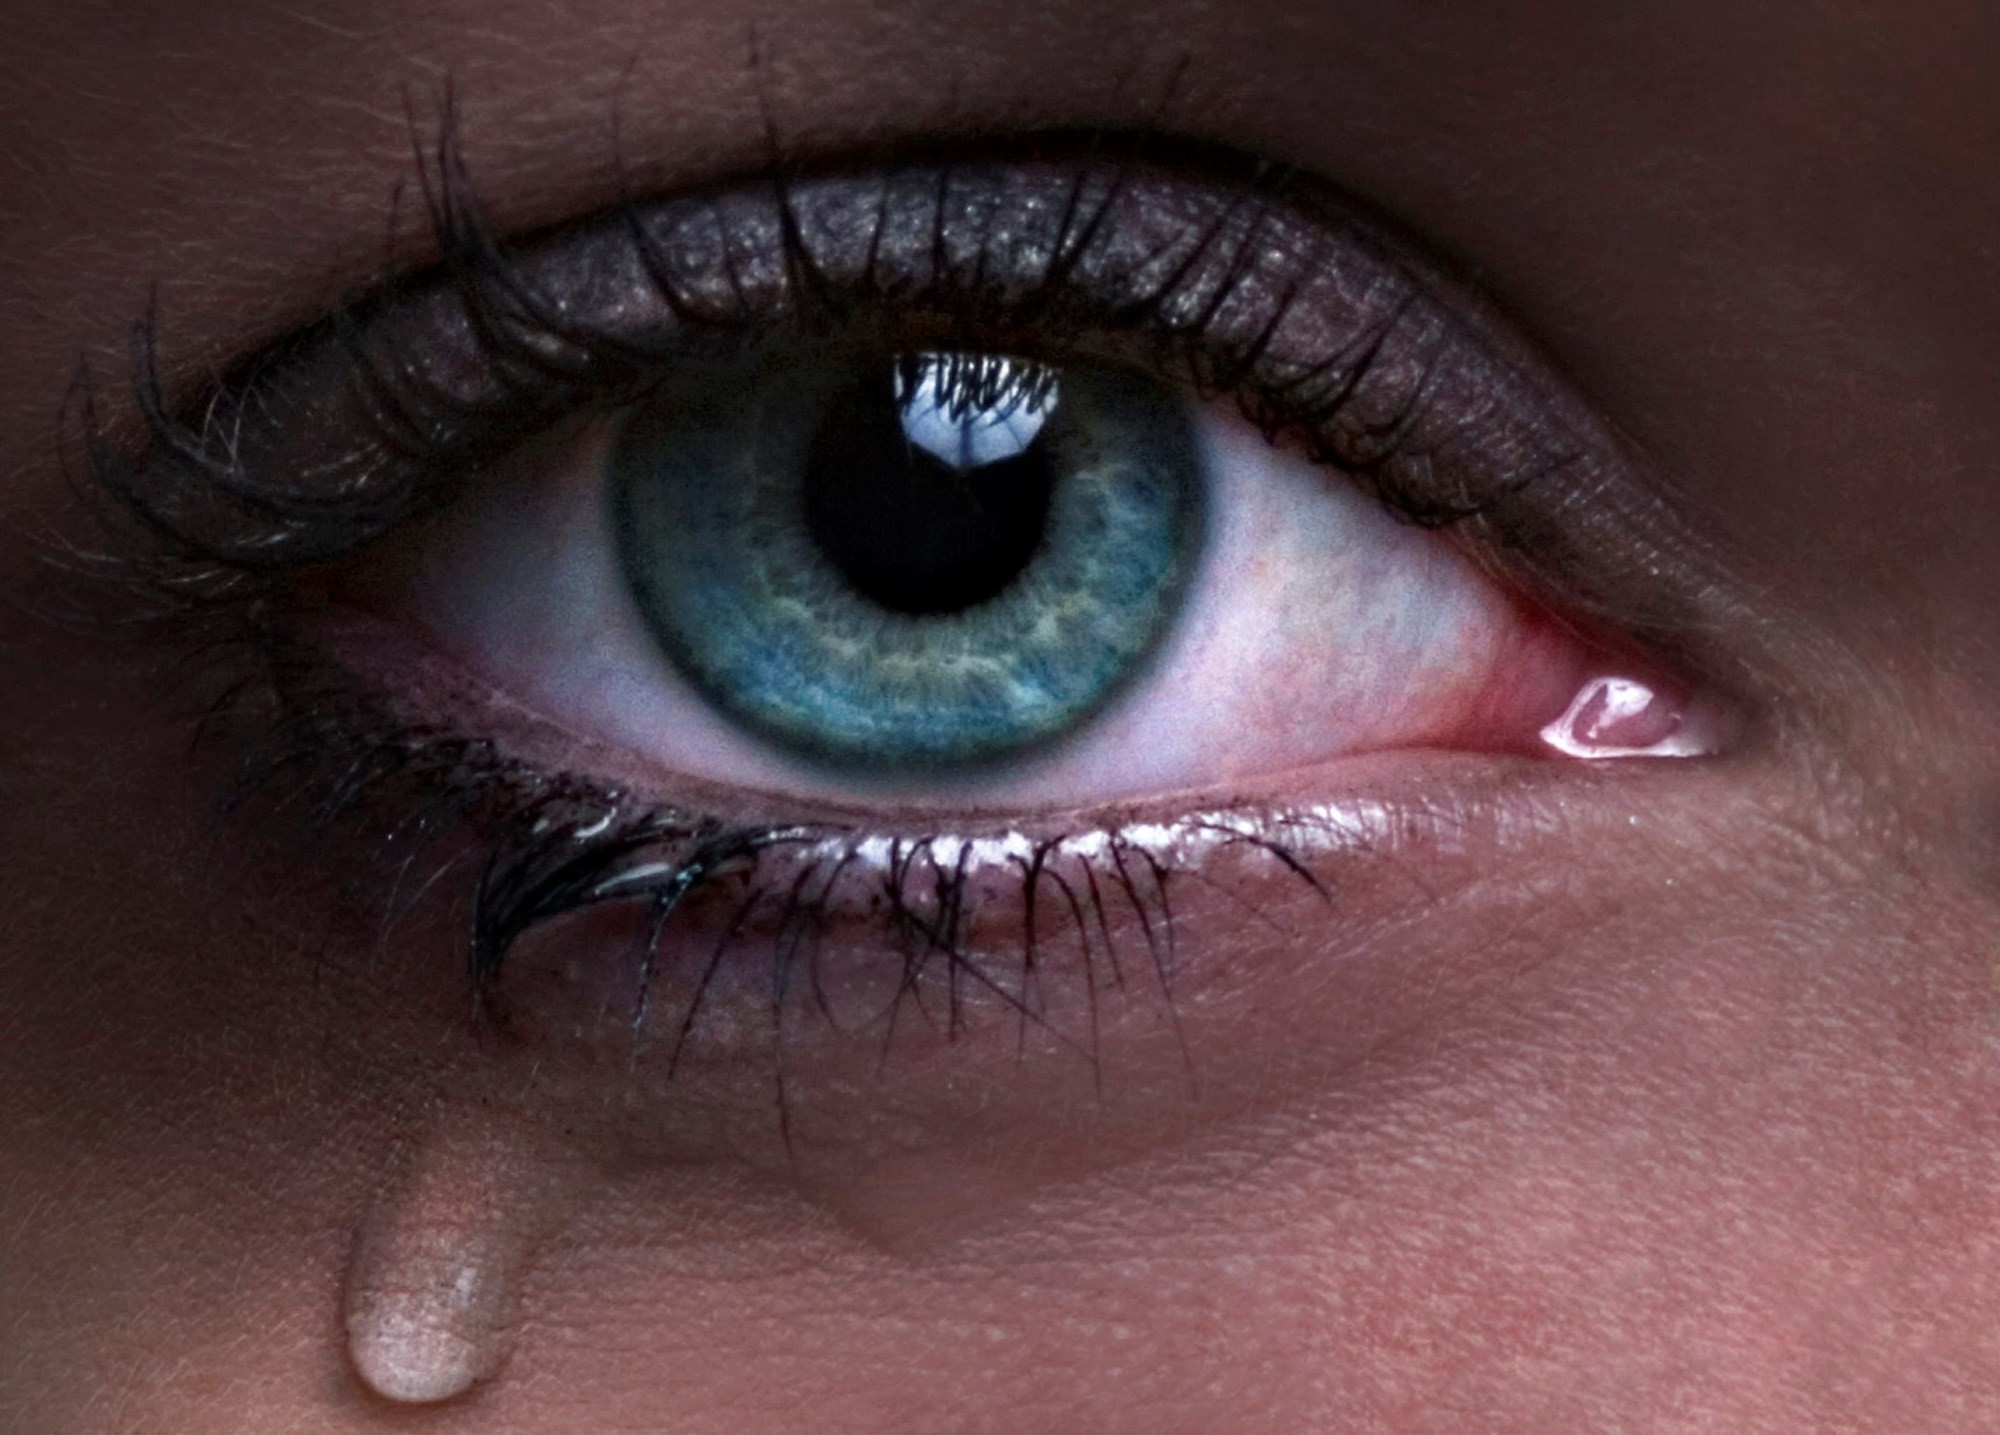 Tears wallpapers 69 images - Eye drawing wallpaper ...